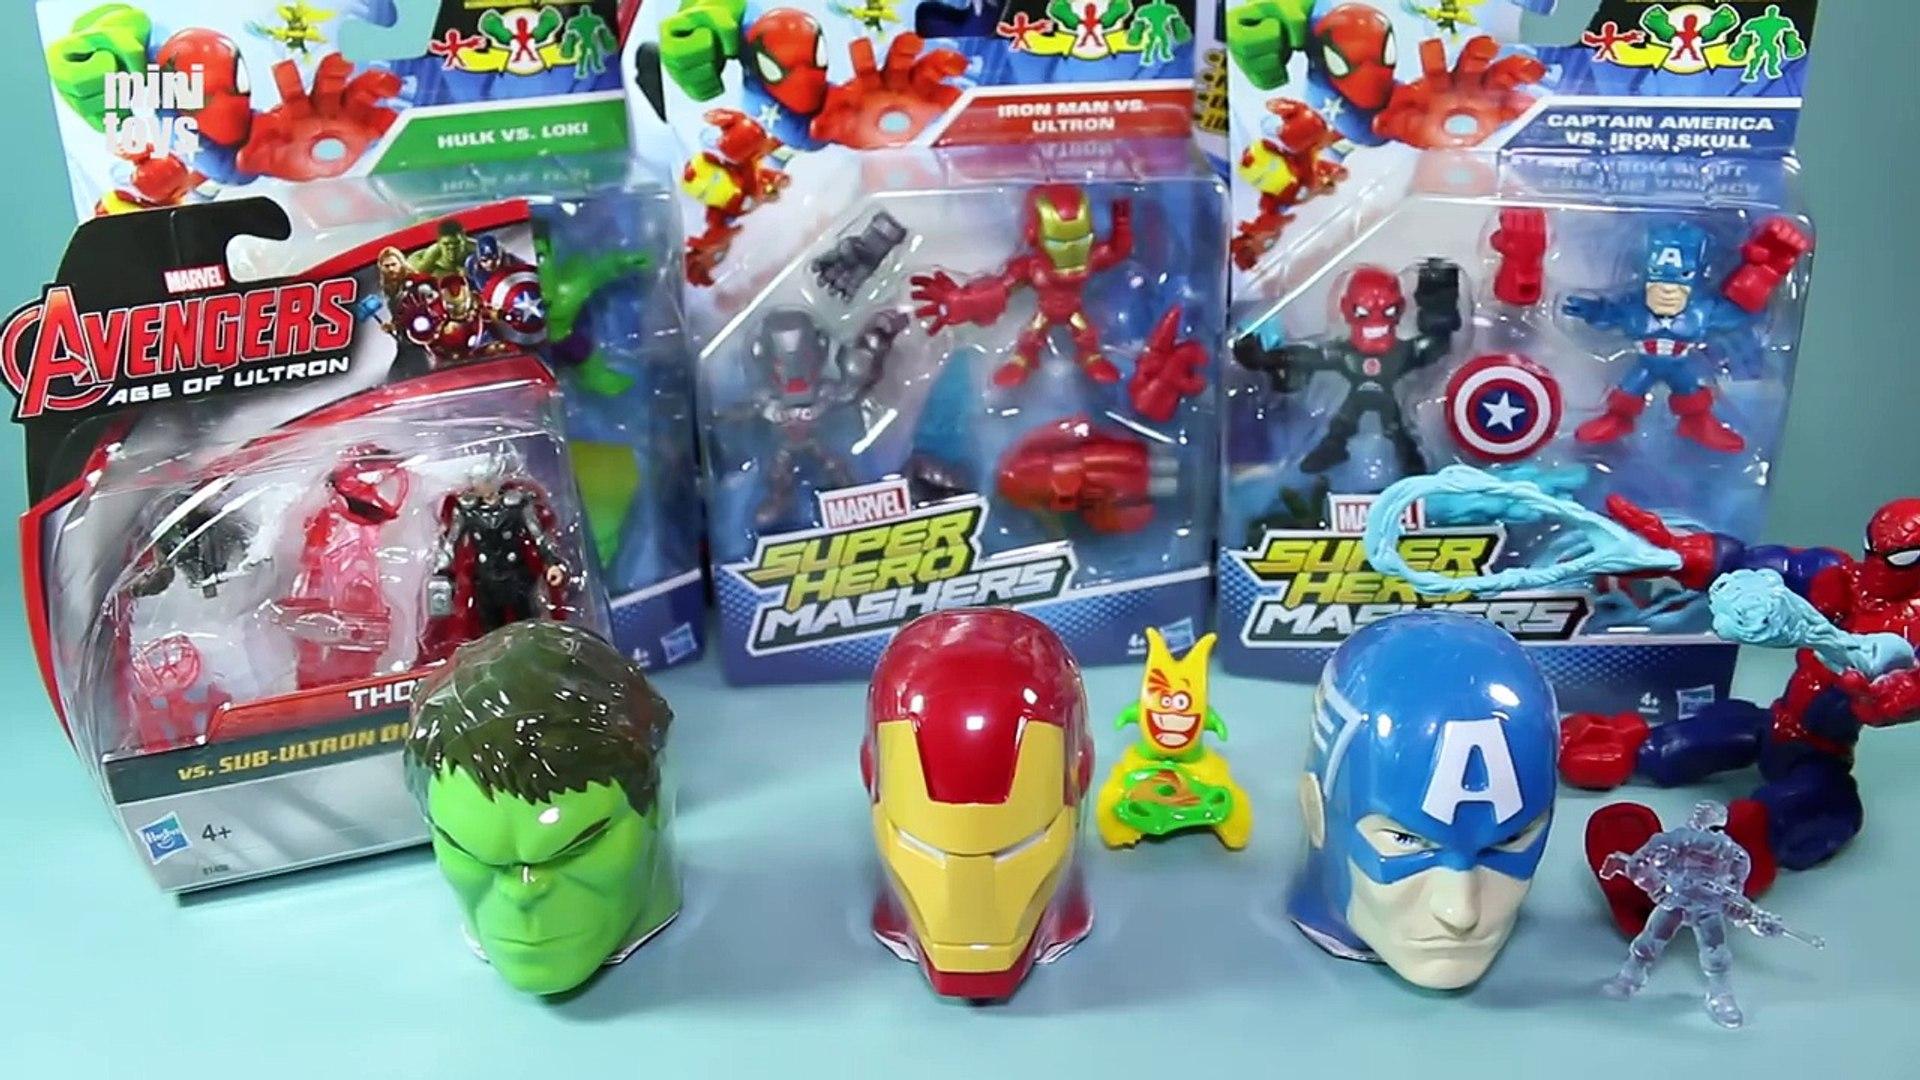 Marvel Superhero Mashers Micro Captain America Vs Iron Skull